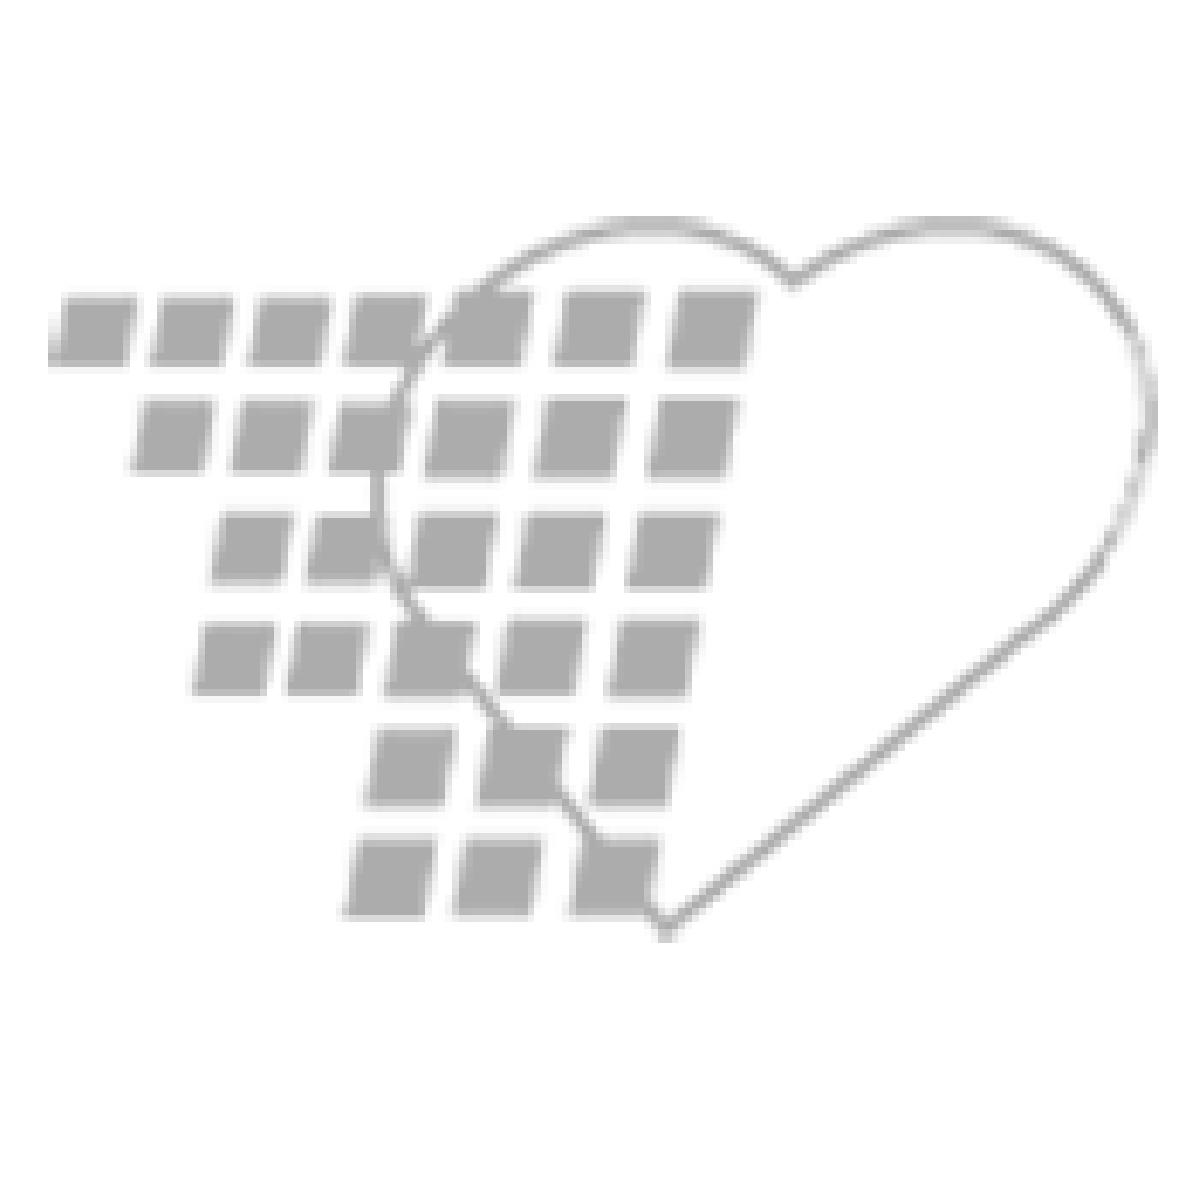 02-24-7500 Welch Allyn Connex® Spot Monitor with BP Massimo SpO2 SureTemp